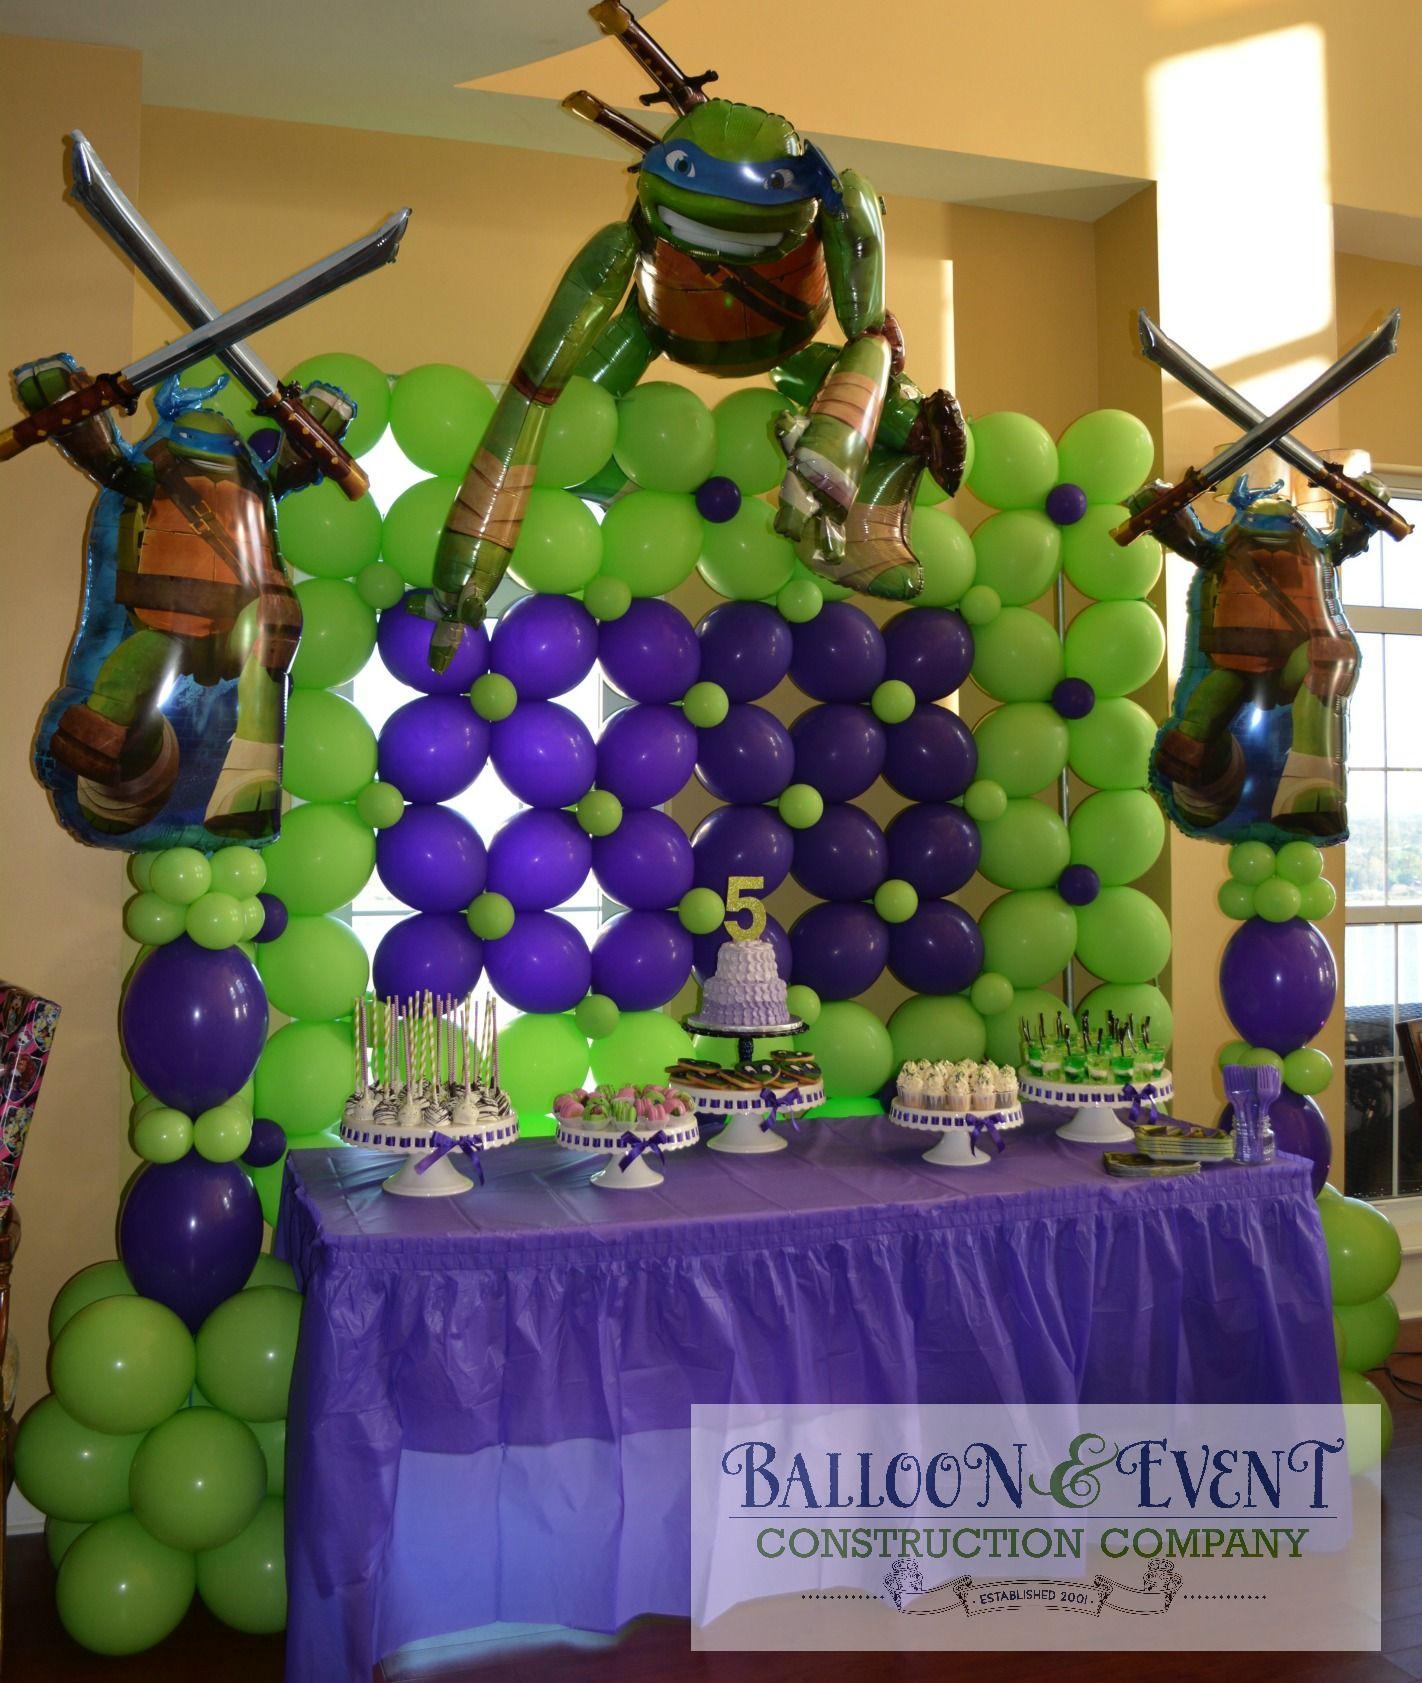 Amazing Backdrop For A Cake Display Balloon Decorations Ninja Turtle Birthday Theme Ninja Turtles Birthday Party